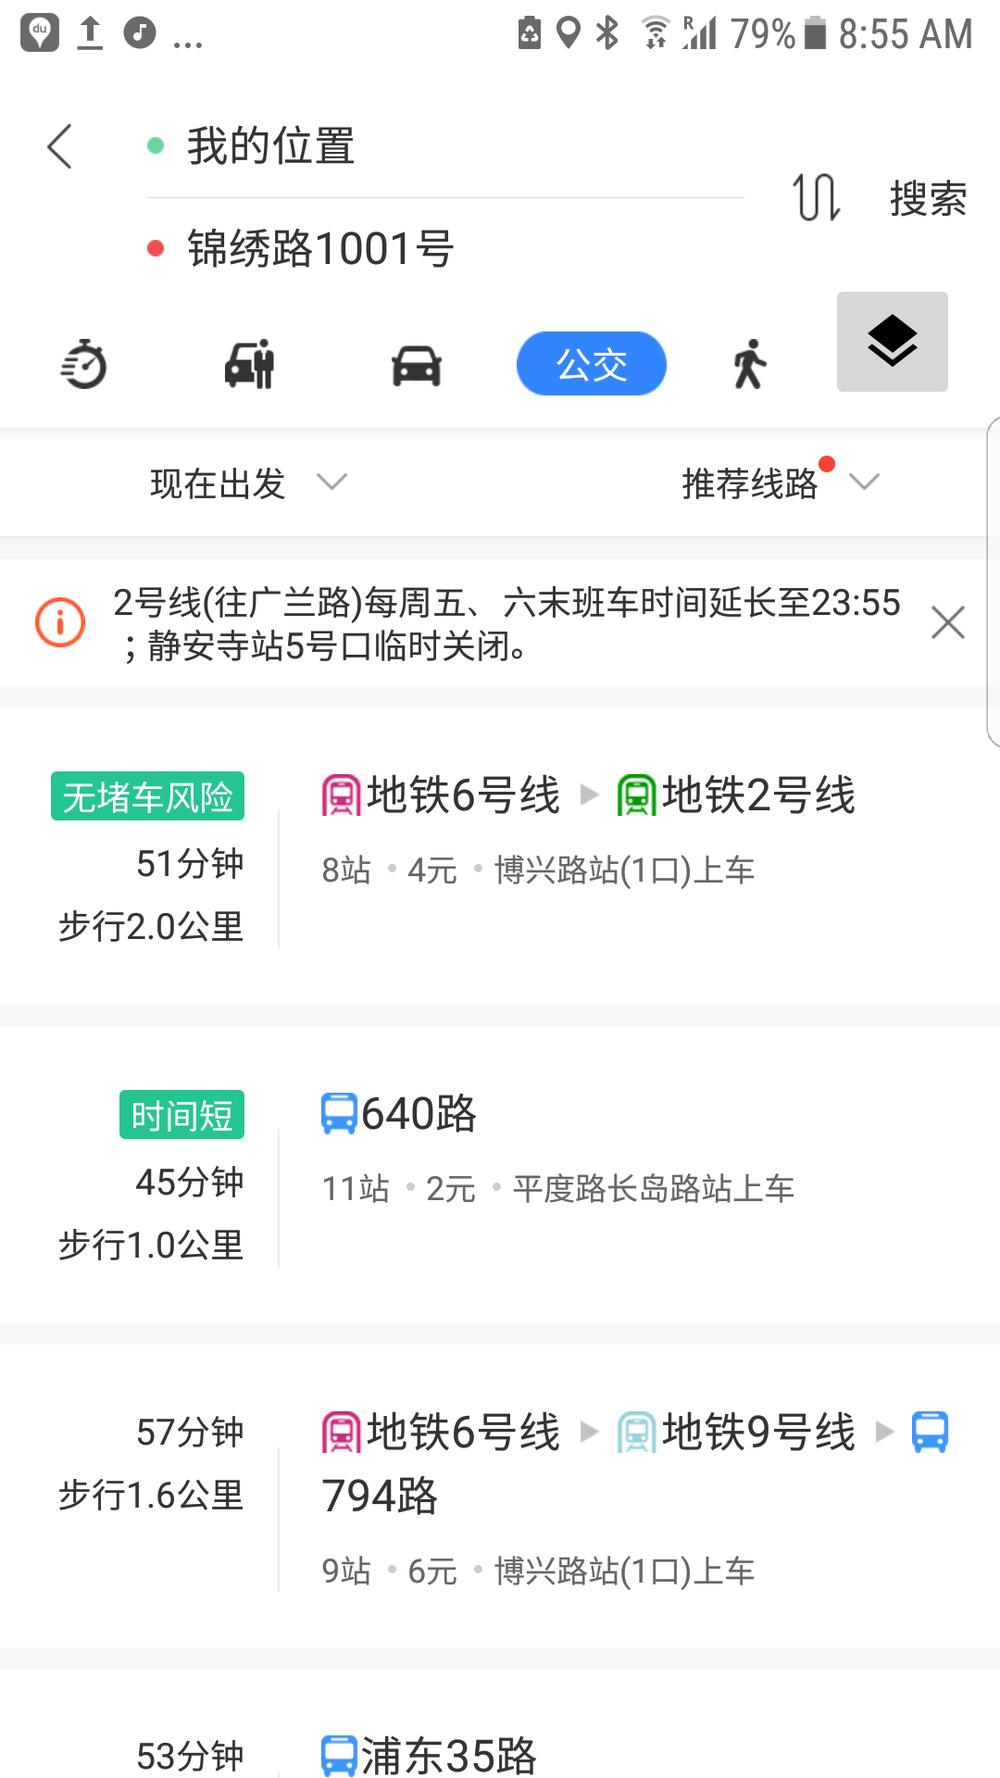 Screenshot_20180330-085503.png